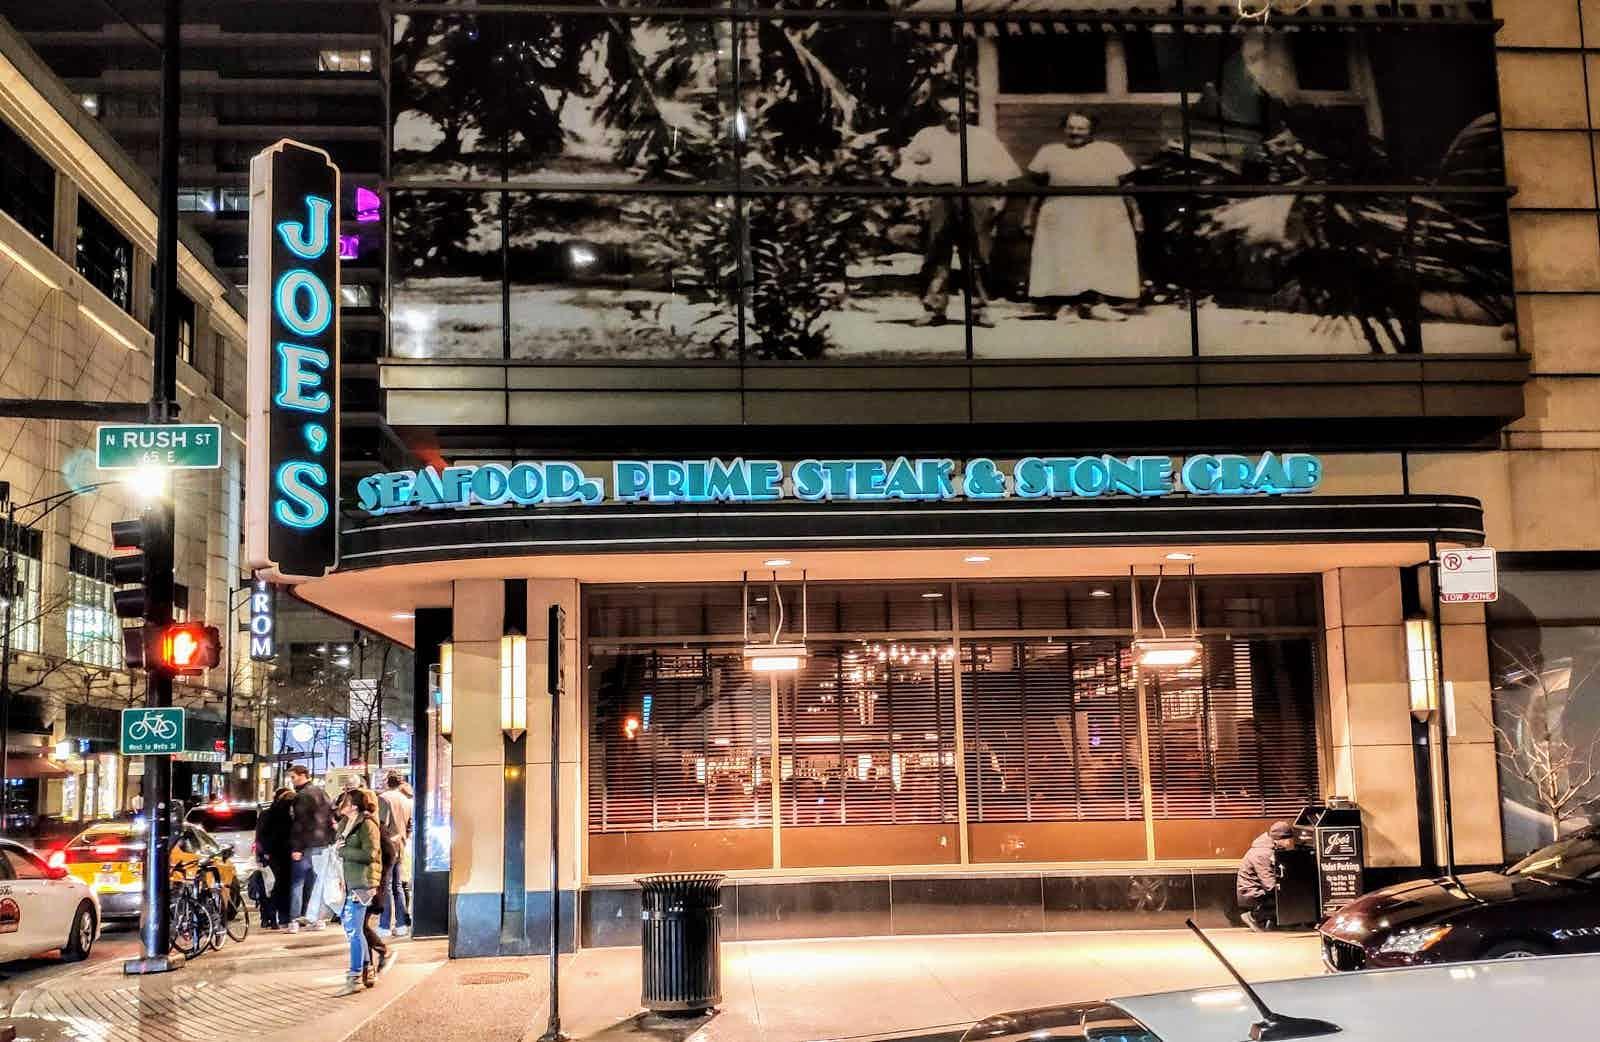 The 50 Best Restaurants in Chicago - Zagat